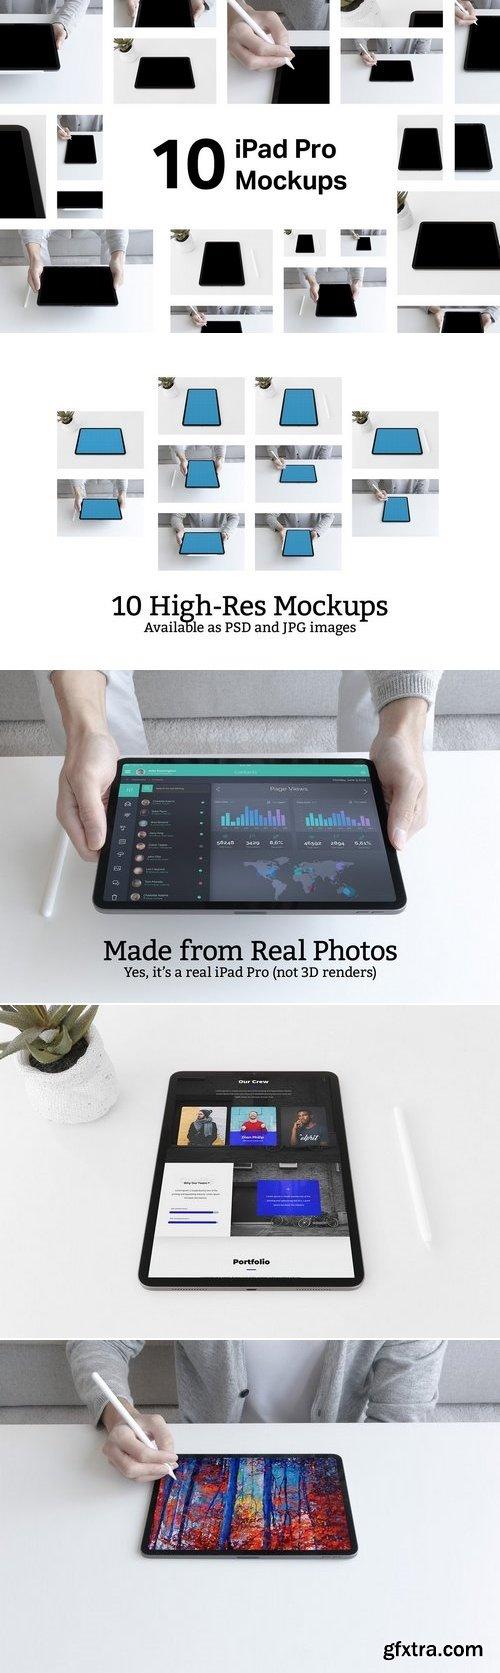 CM - 10 iPad Pro (3rd Generation) Mockups 3156329